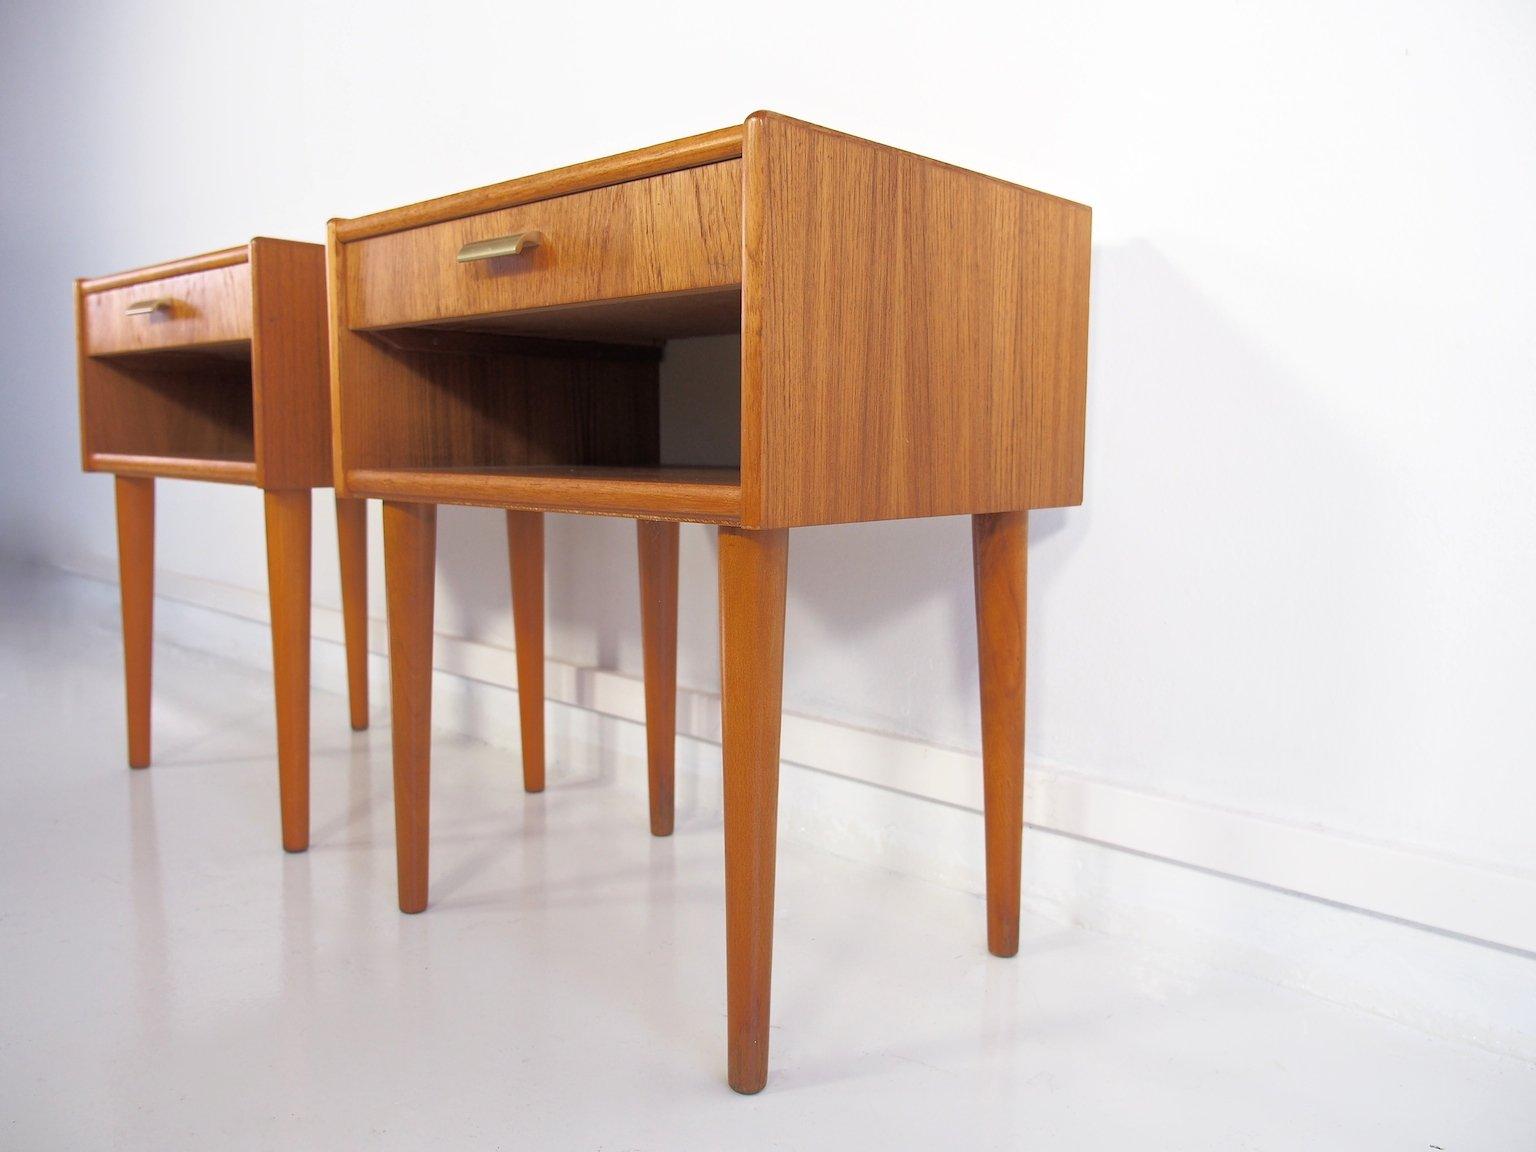 tables de nuit vintage moderne en teck scandinavie set de 2 en vente sur pamono. Black Bedroom Furniture Sets. Home Design Ideas